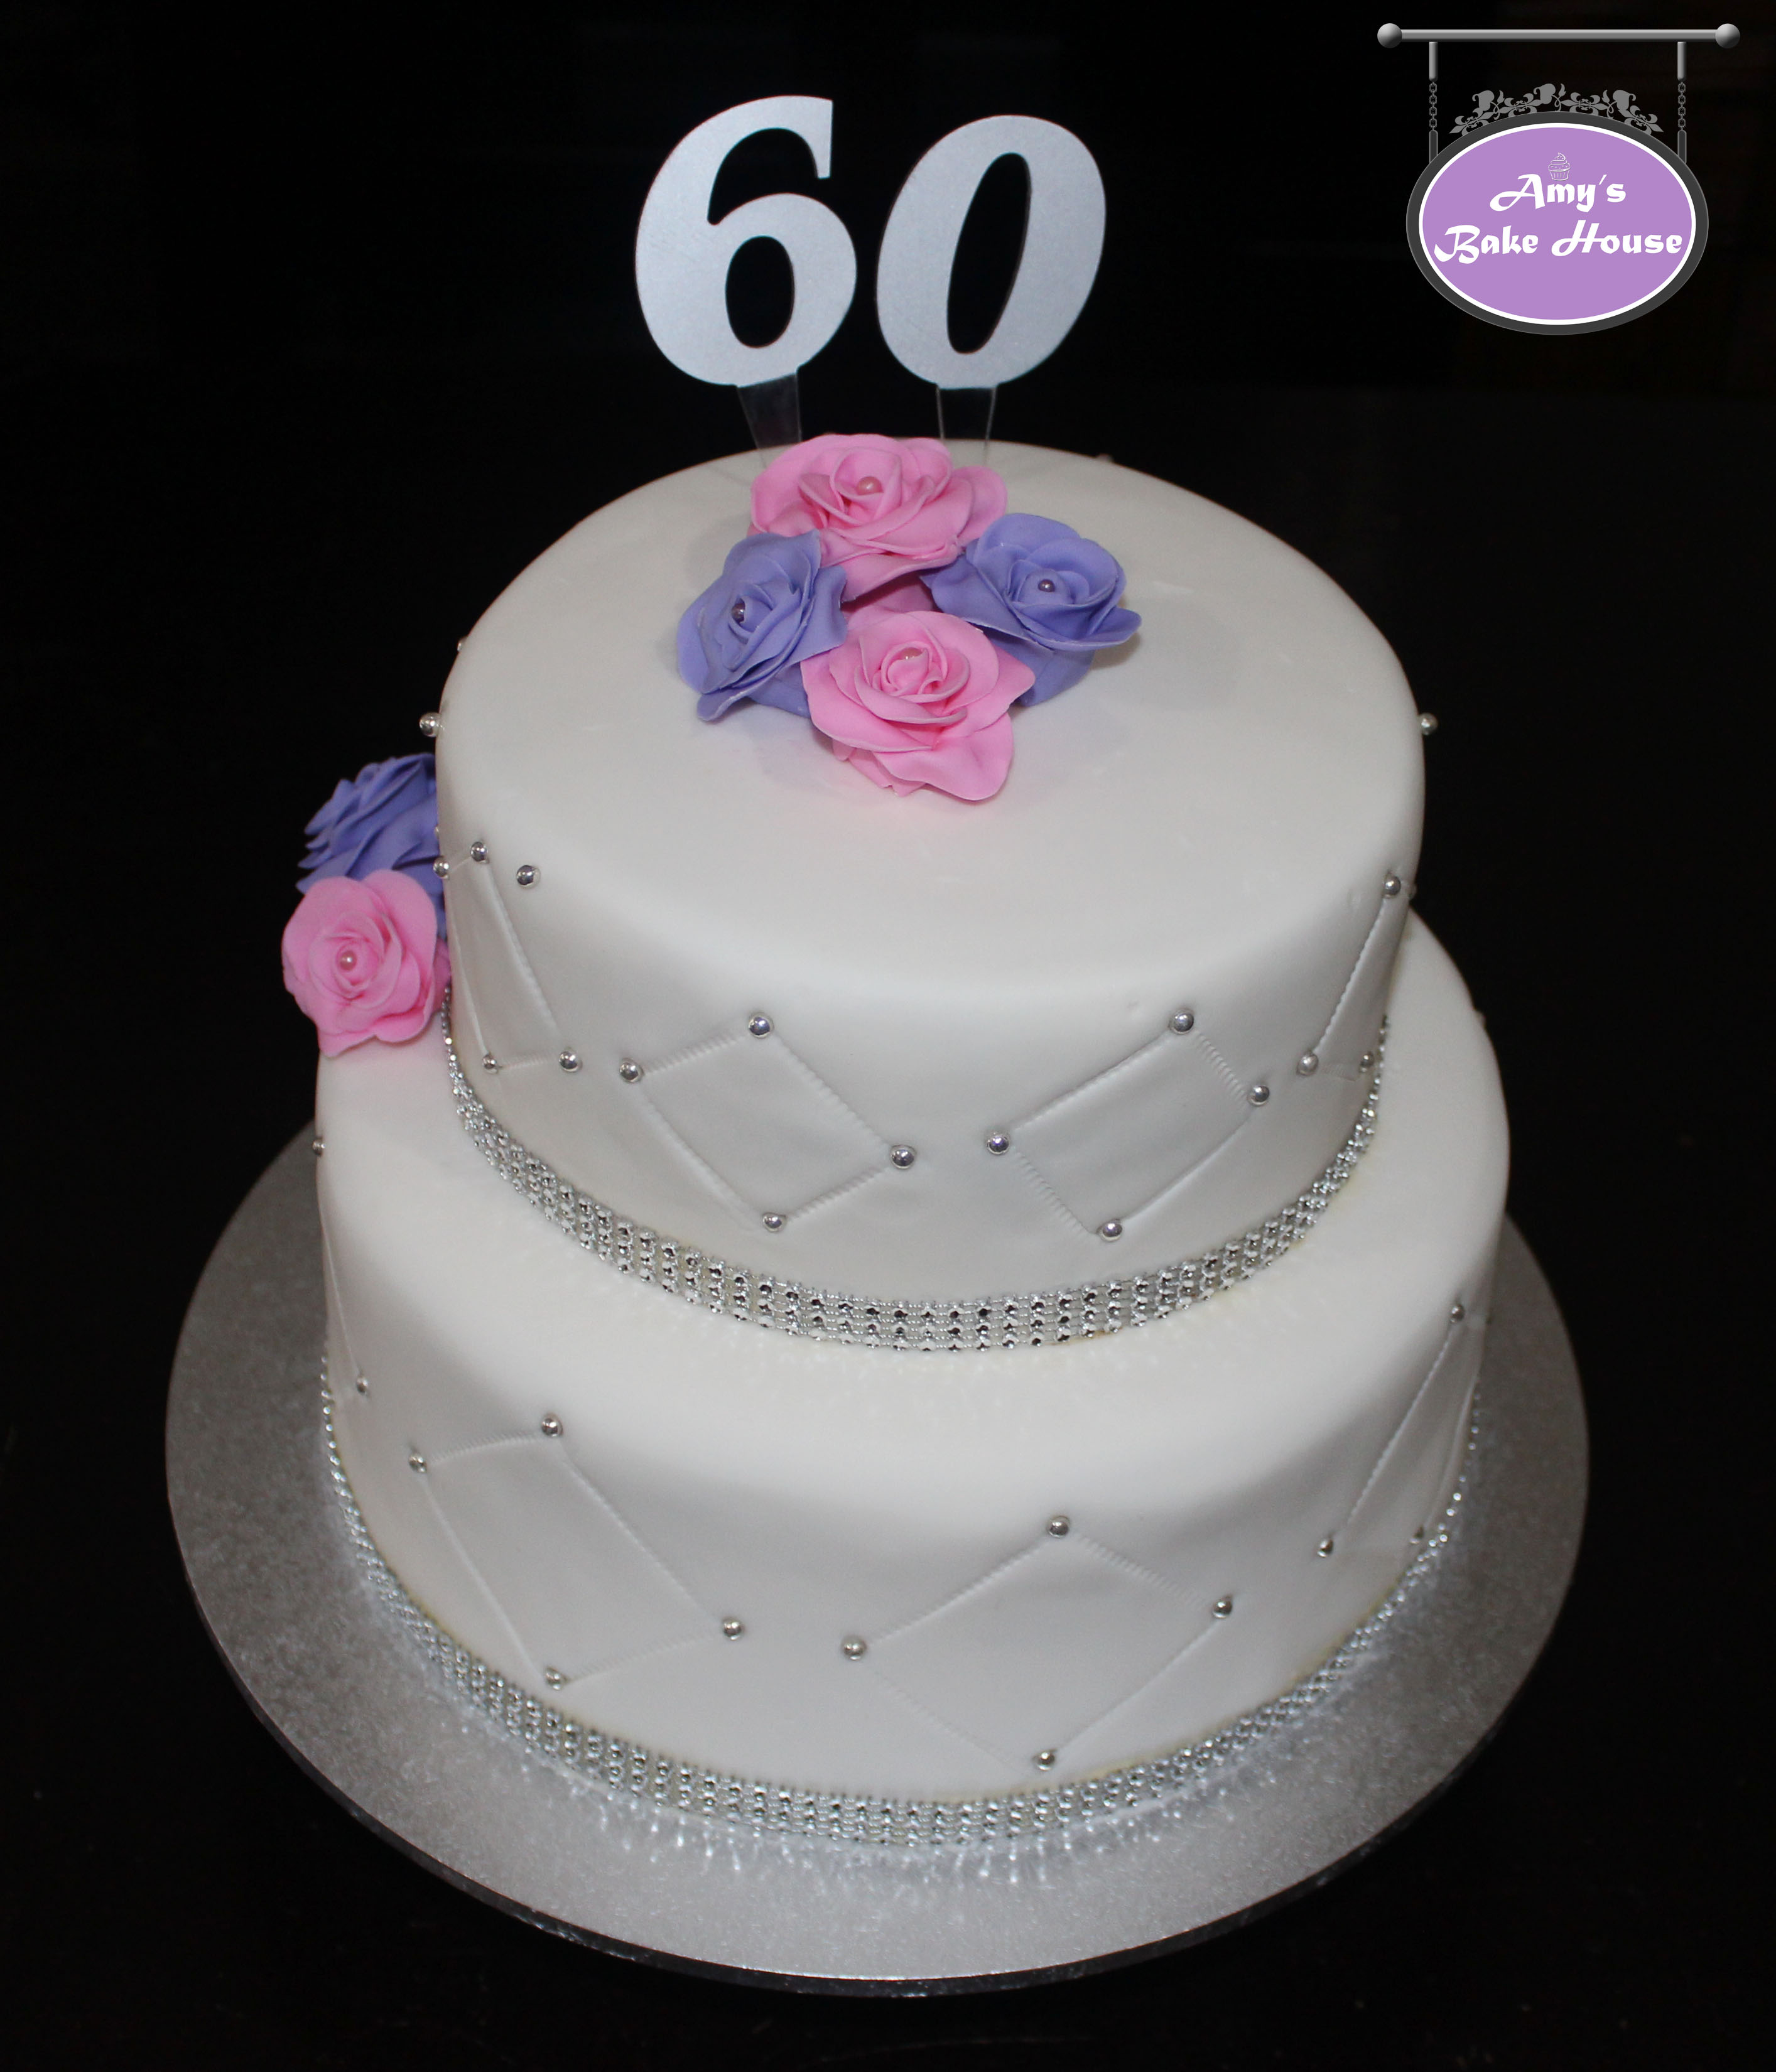 60th Birthday Cake Amys Bake House